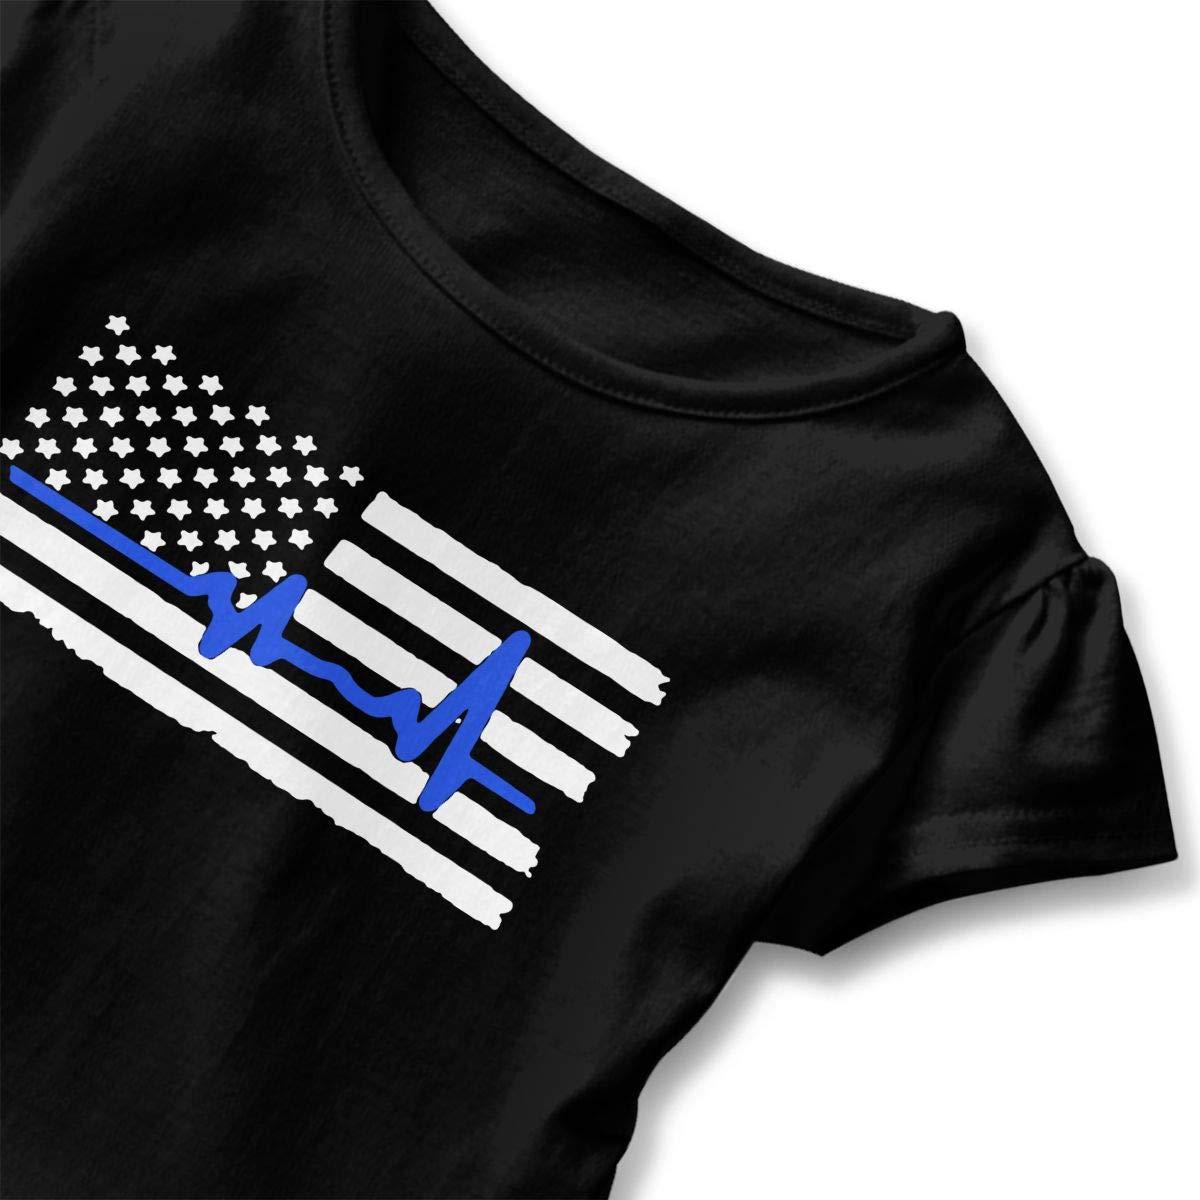 Police Heartbeat Thin Blue Line Shirt Kids Girls Short Sleeve Ruffles Shirt T-Shirt for 2-6 Toddlers